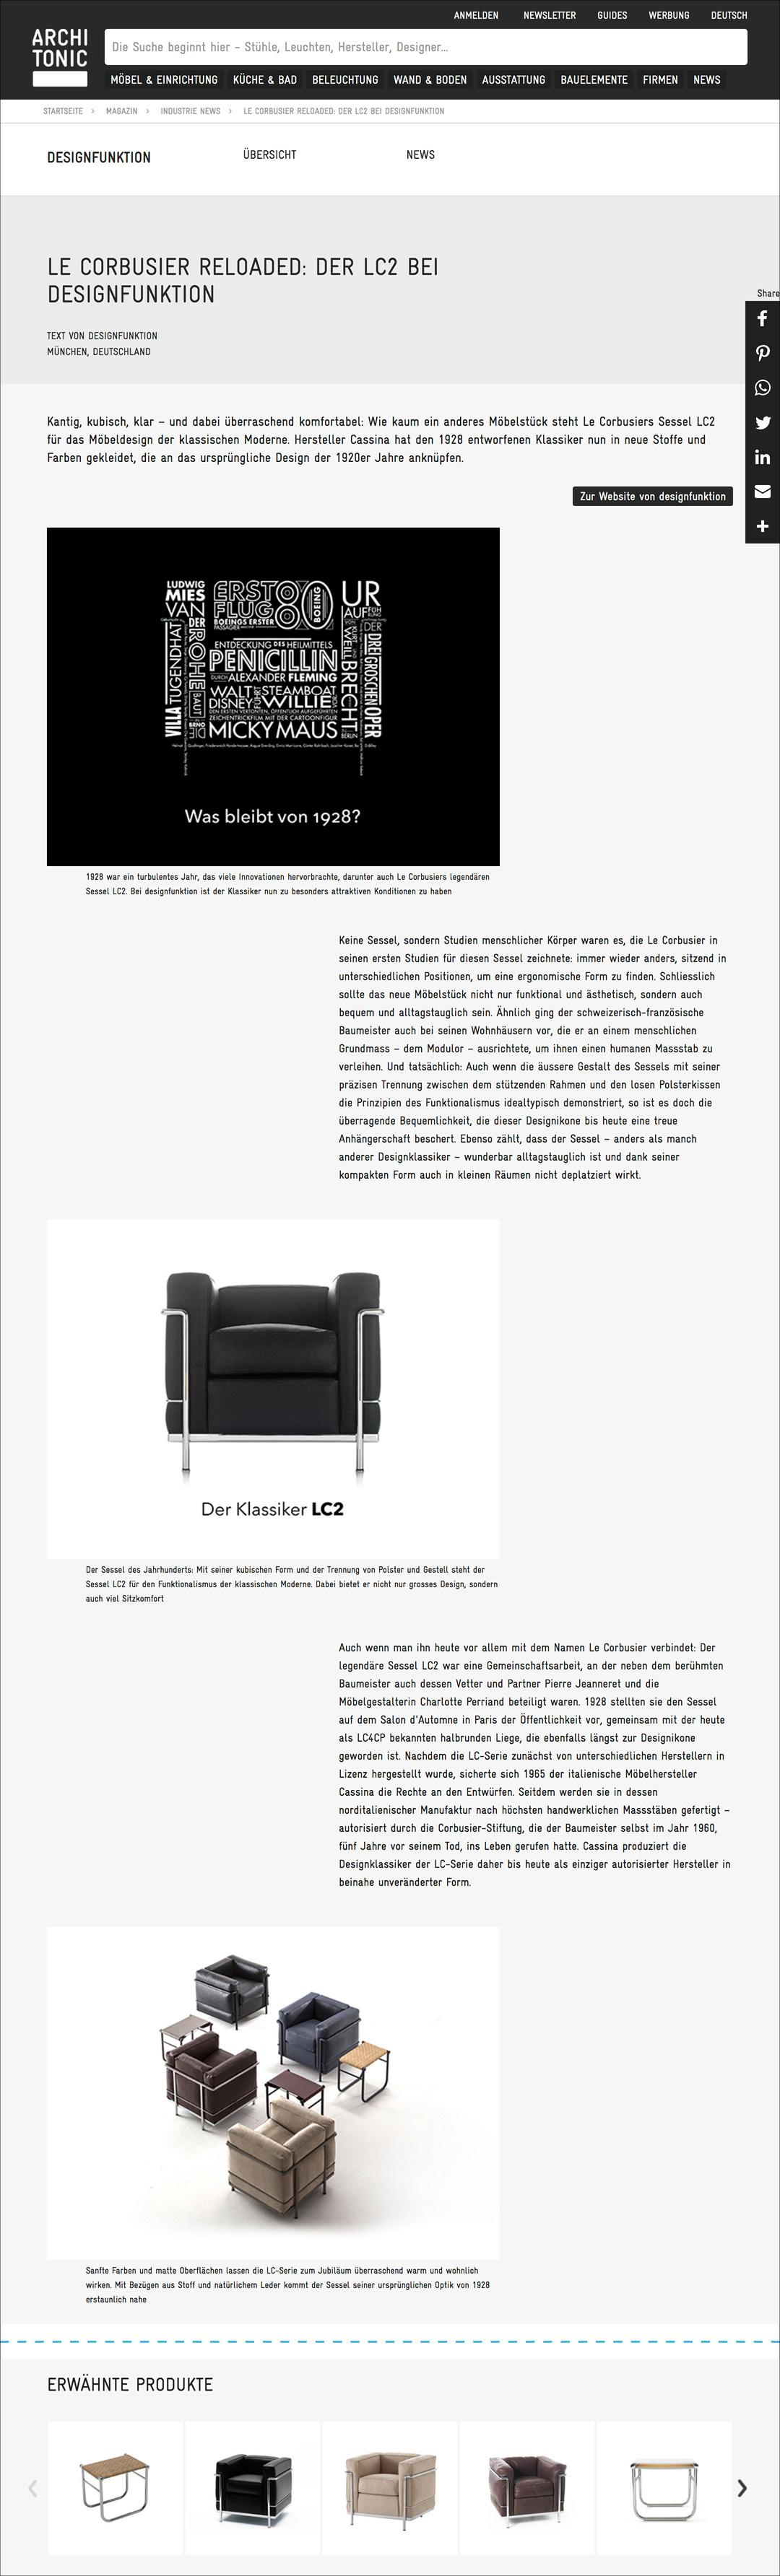 story-post_designfunktion_corbusier-reloaded_de.jpg